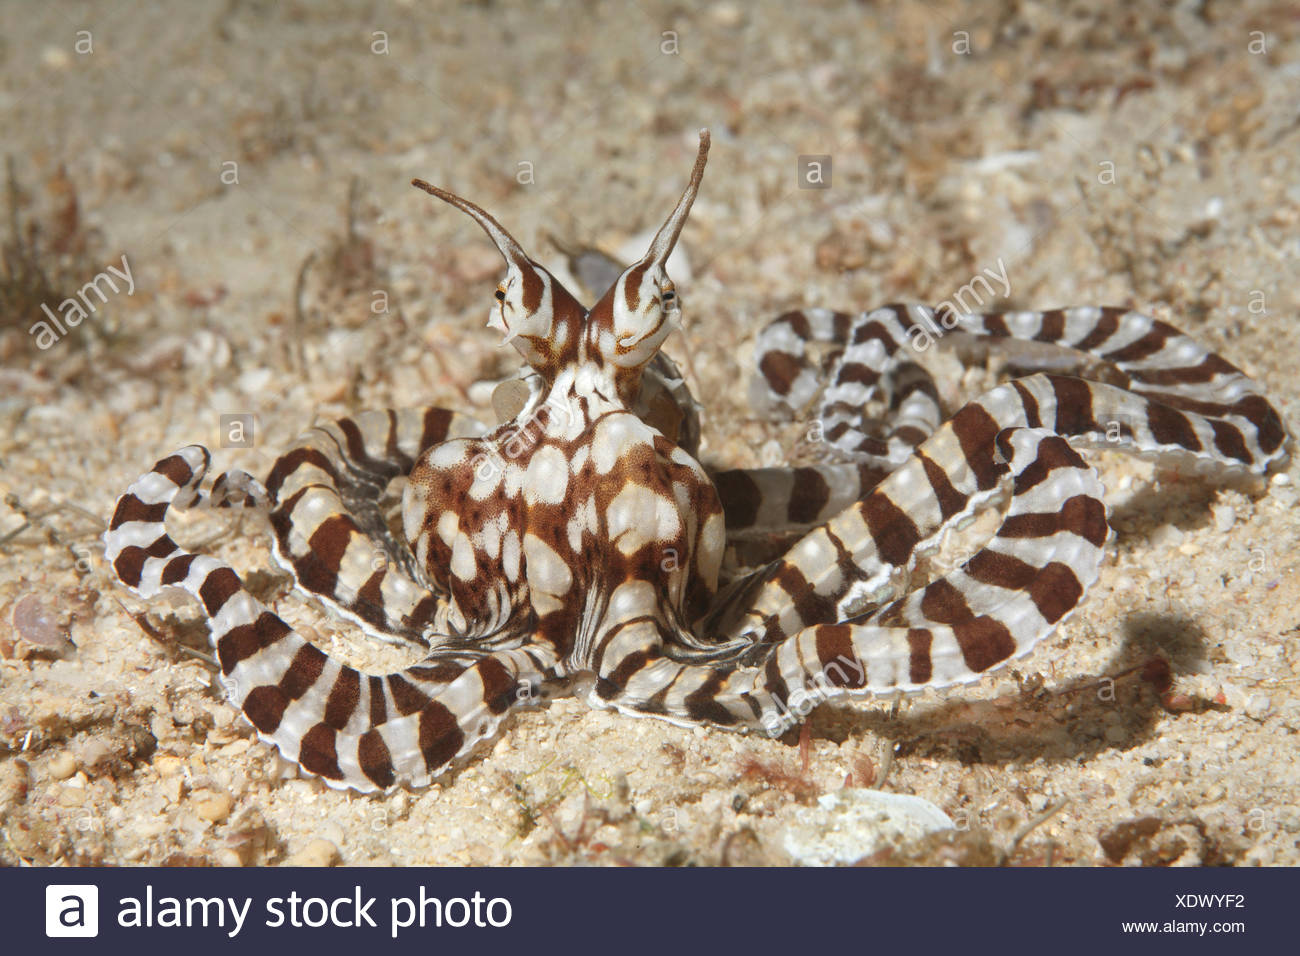 Mimicry Octopus (Thaumoctopus mimicus), Sabang beach, Puerto Galera, Mindoro, Philippines - Stock Image